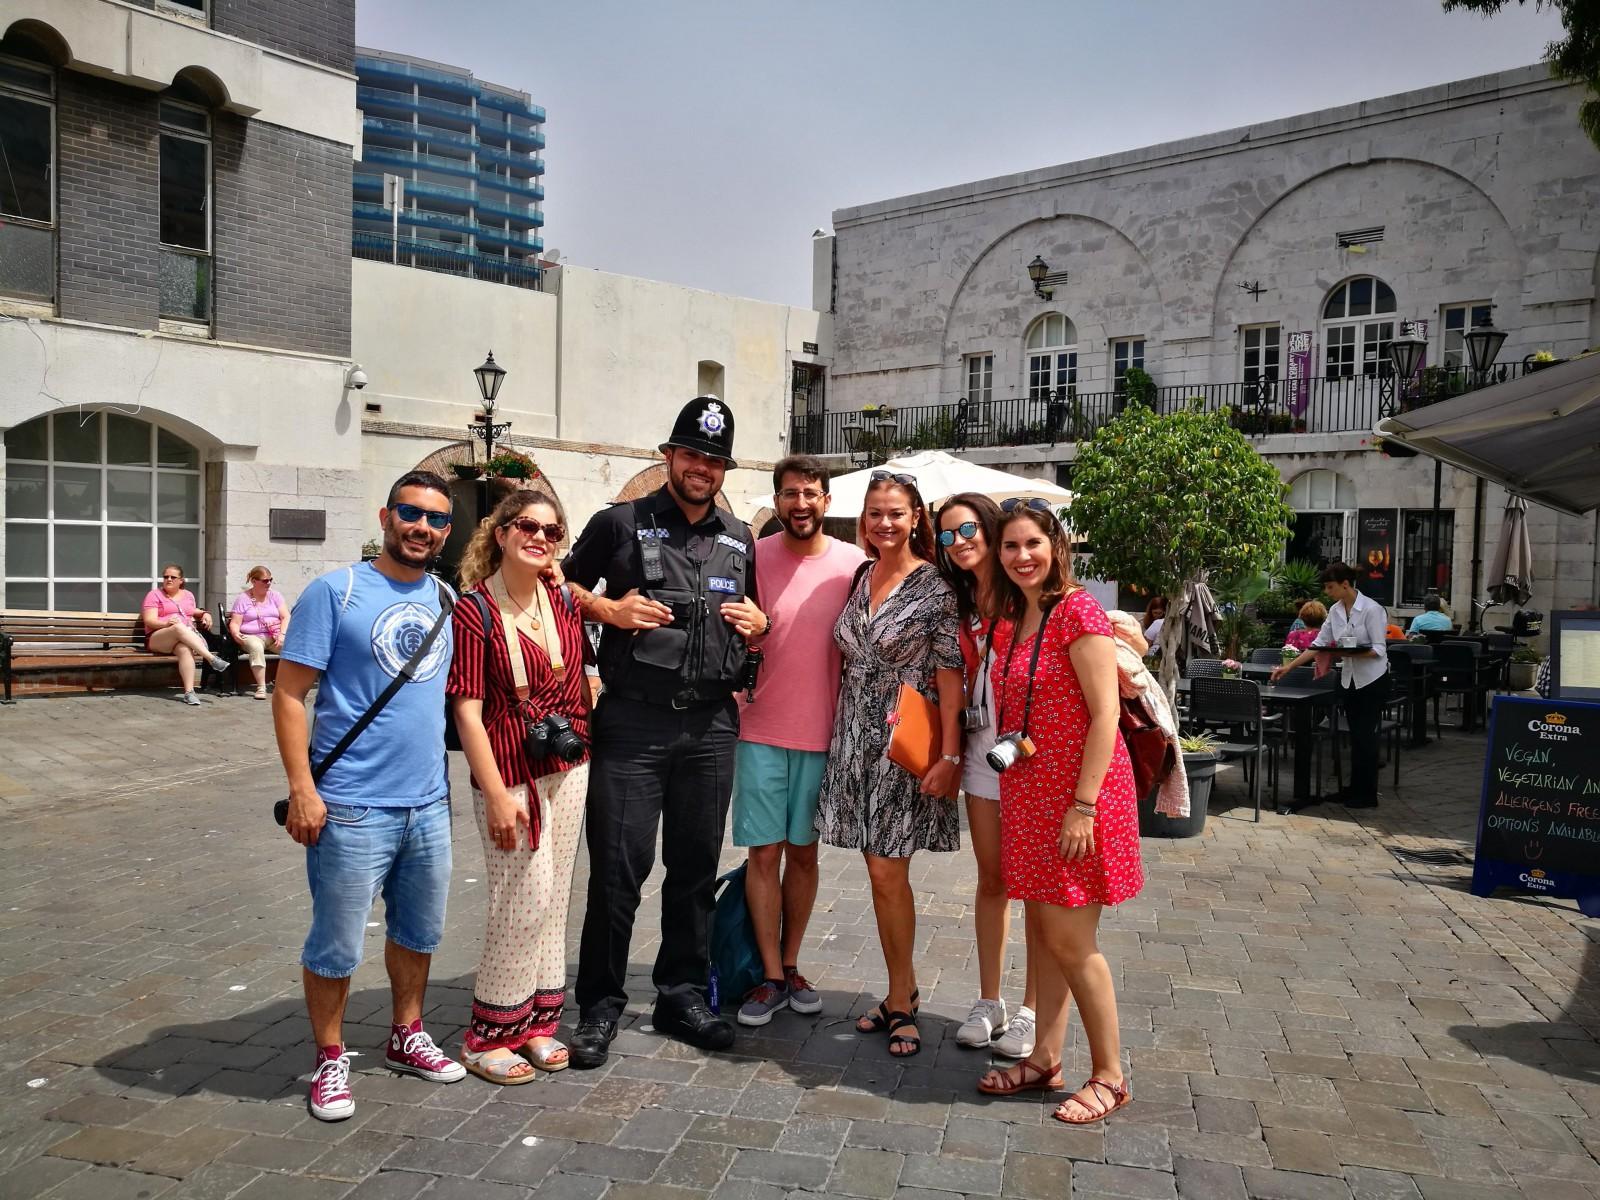 23-jun-2019-blogueros-espaoles-de-viajes-visitan-el-pen_48114499018_o